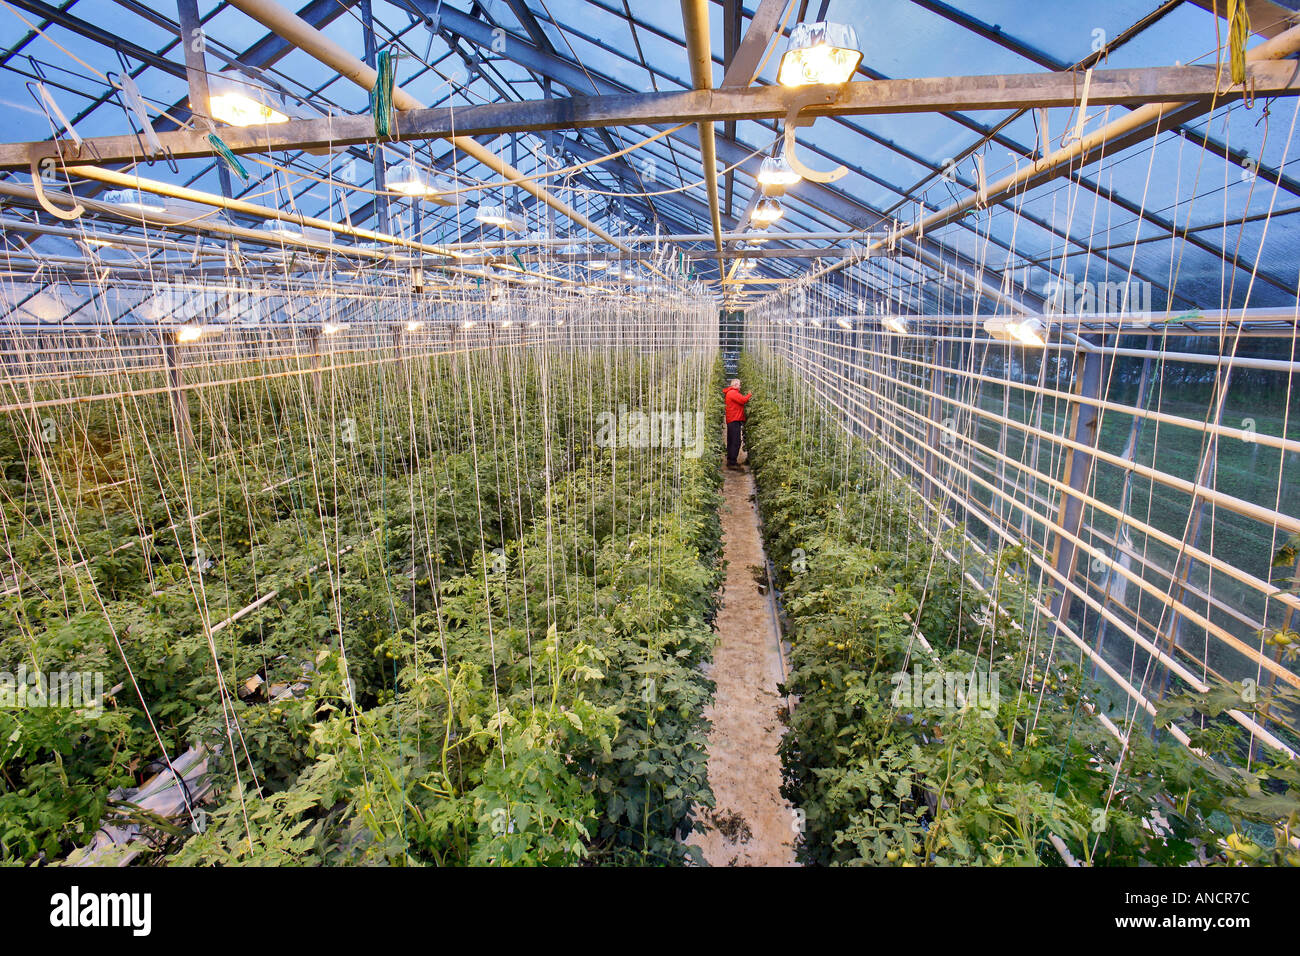 Greenhouse Tomato Growing with Supplementary High Pressure Sodium Vapor Lighting Iceland Stock Photo